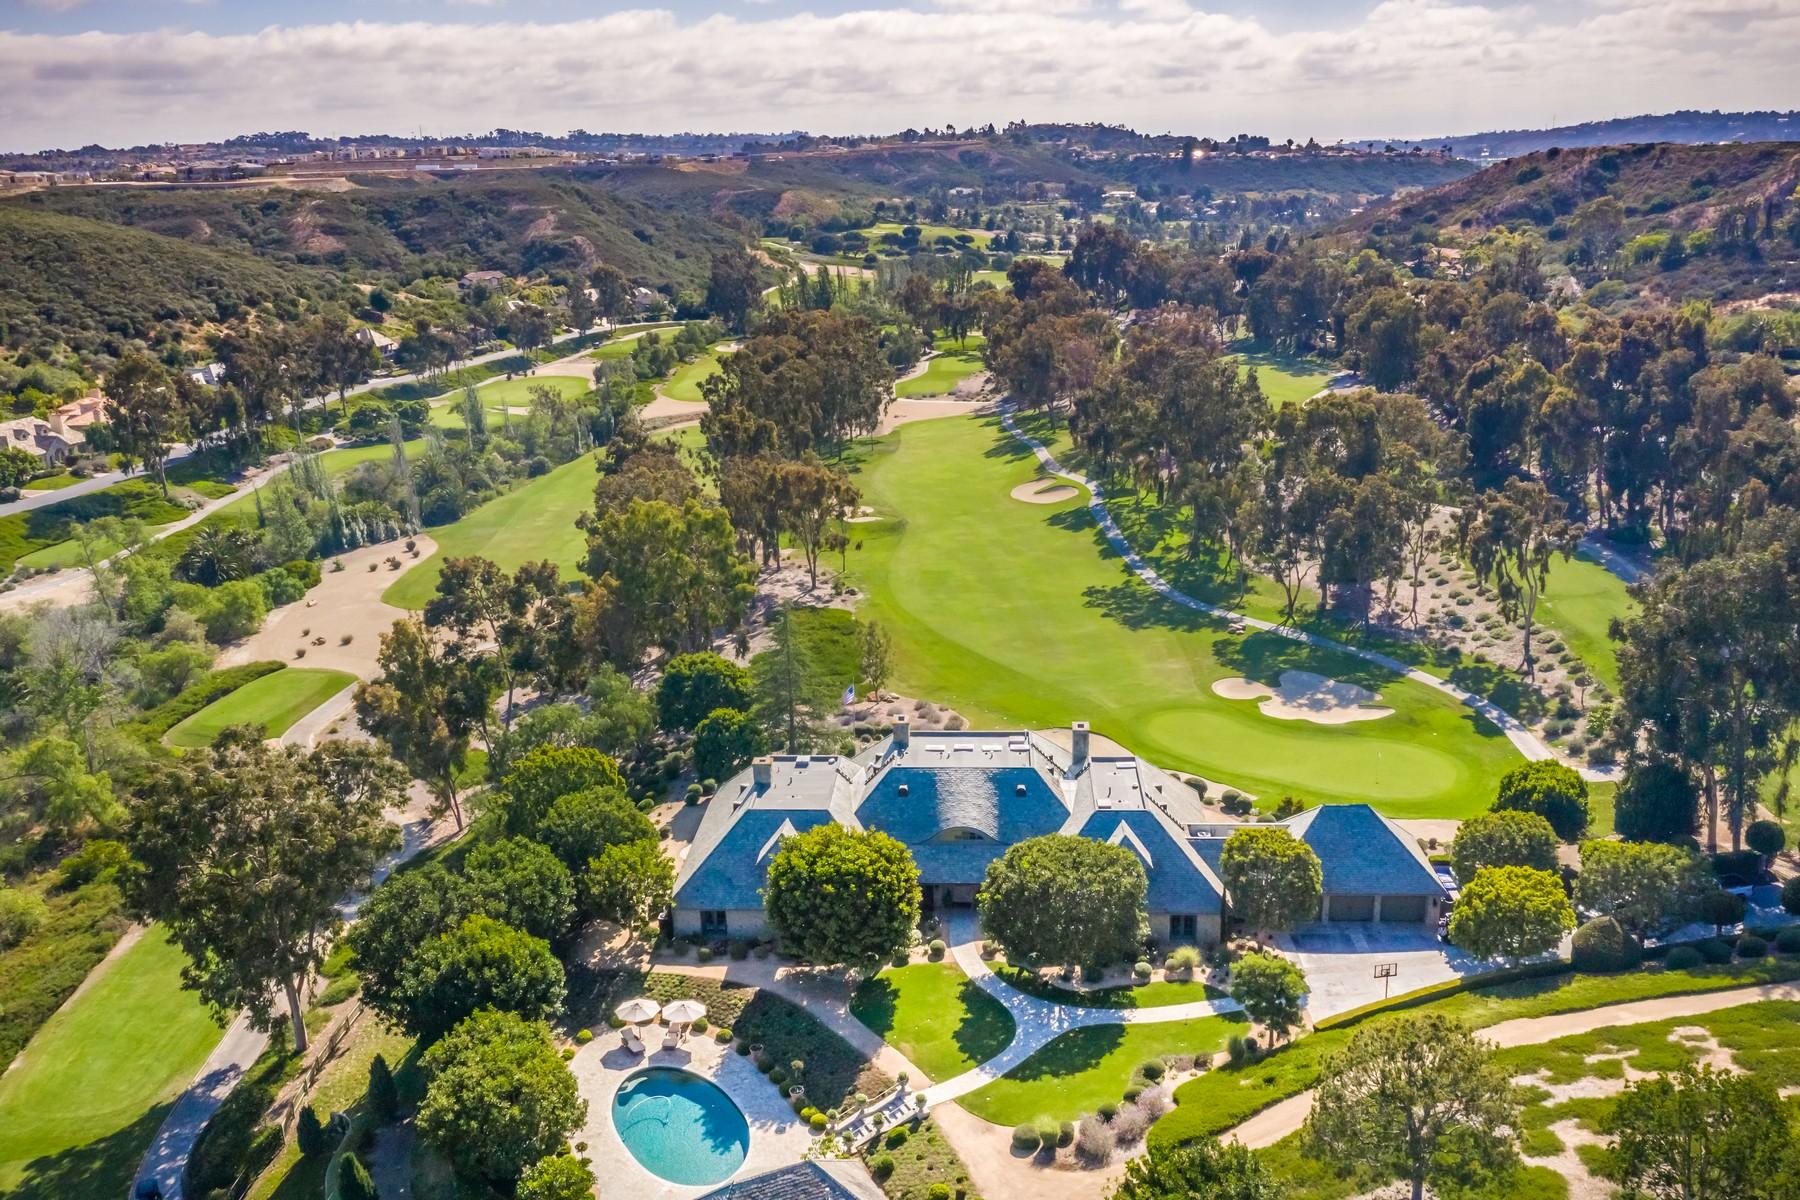 Single Family Homes for Sale at 14497 Emerald Lane Rancho Santa Fe, California 92067 United States